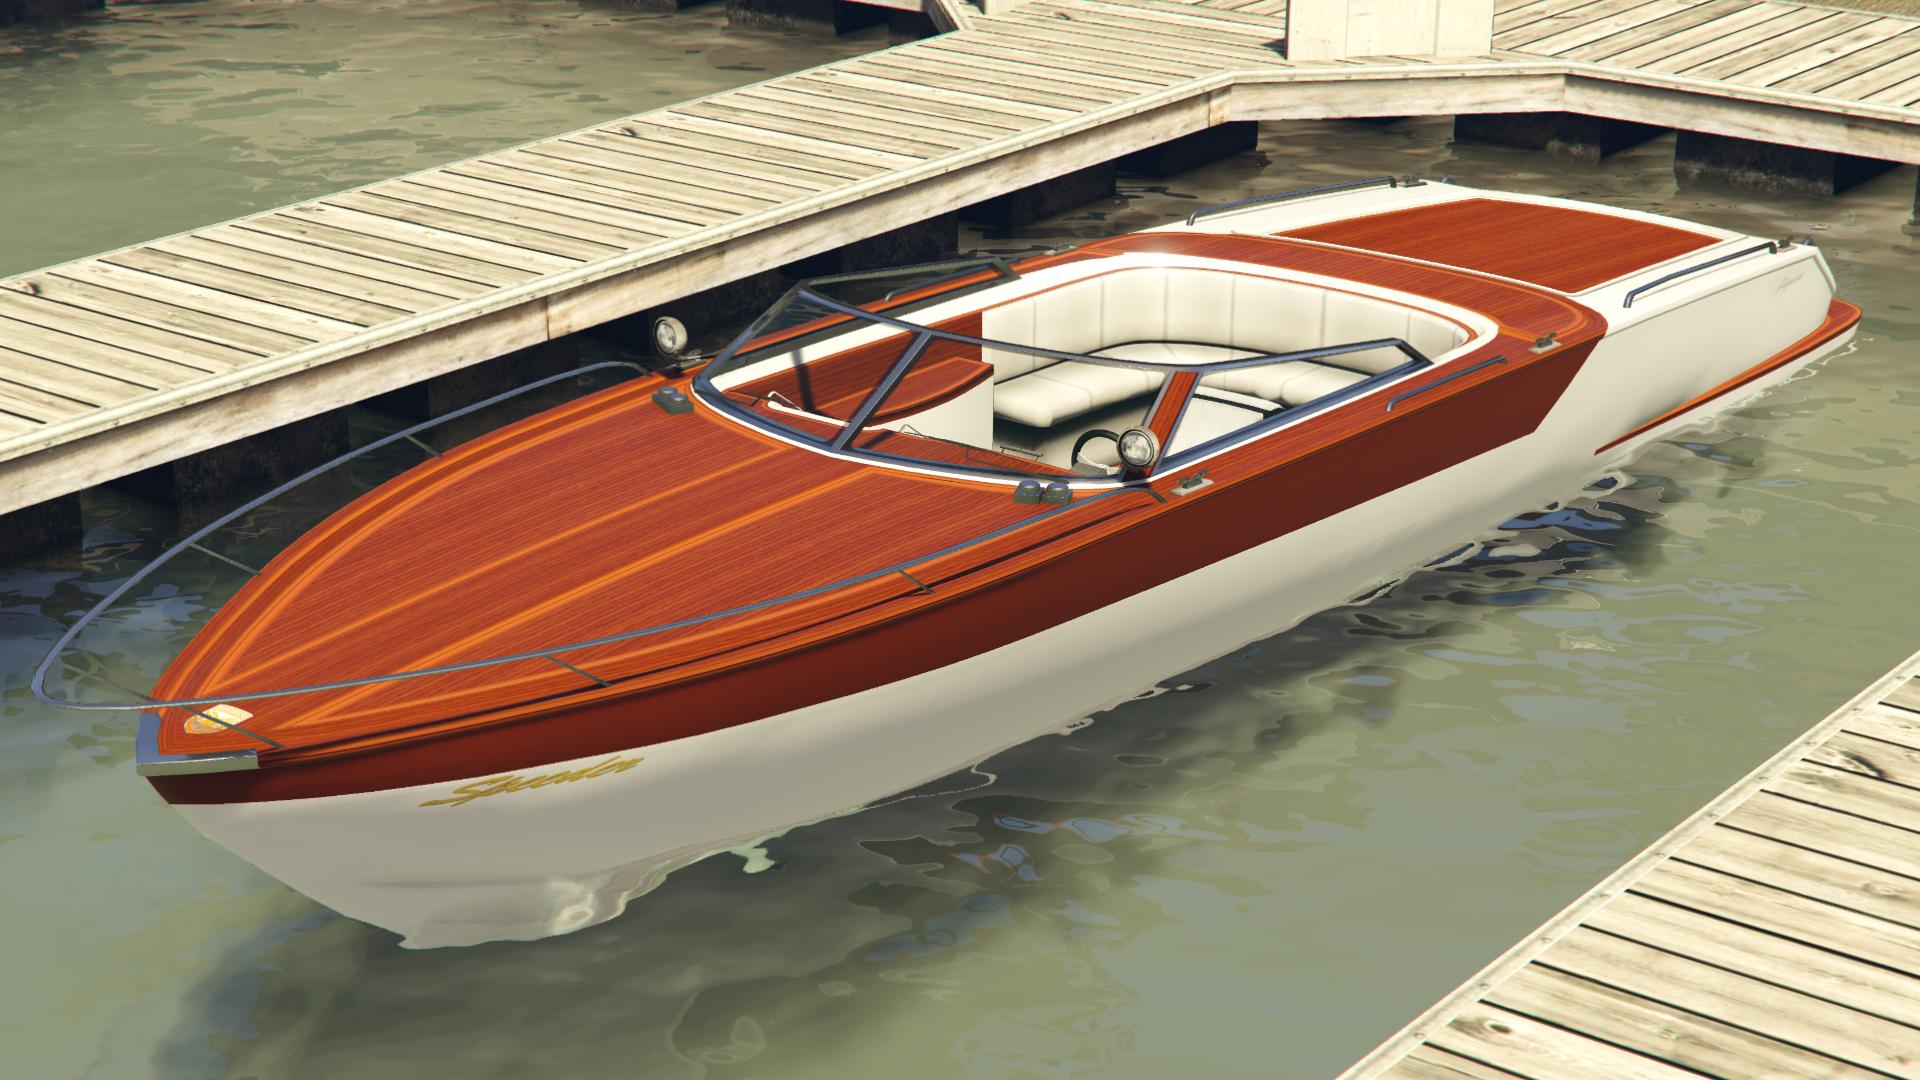 Image cj gtav transparent png gta wiki the grand theft auto wiki - Speeder A Speeder In Grand Theft Auto